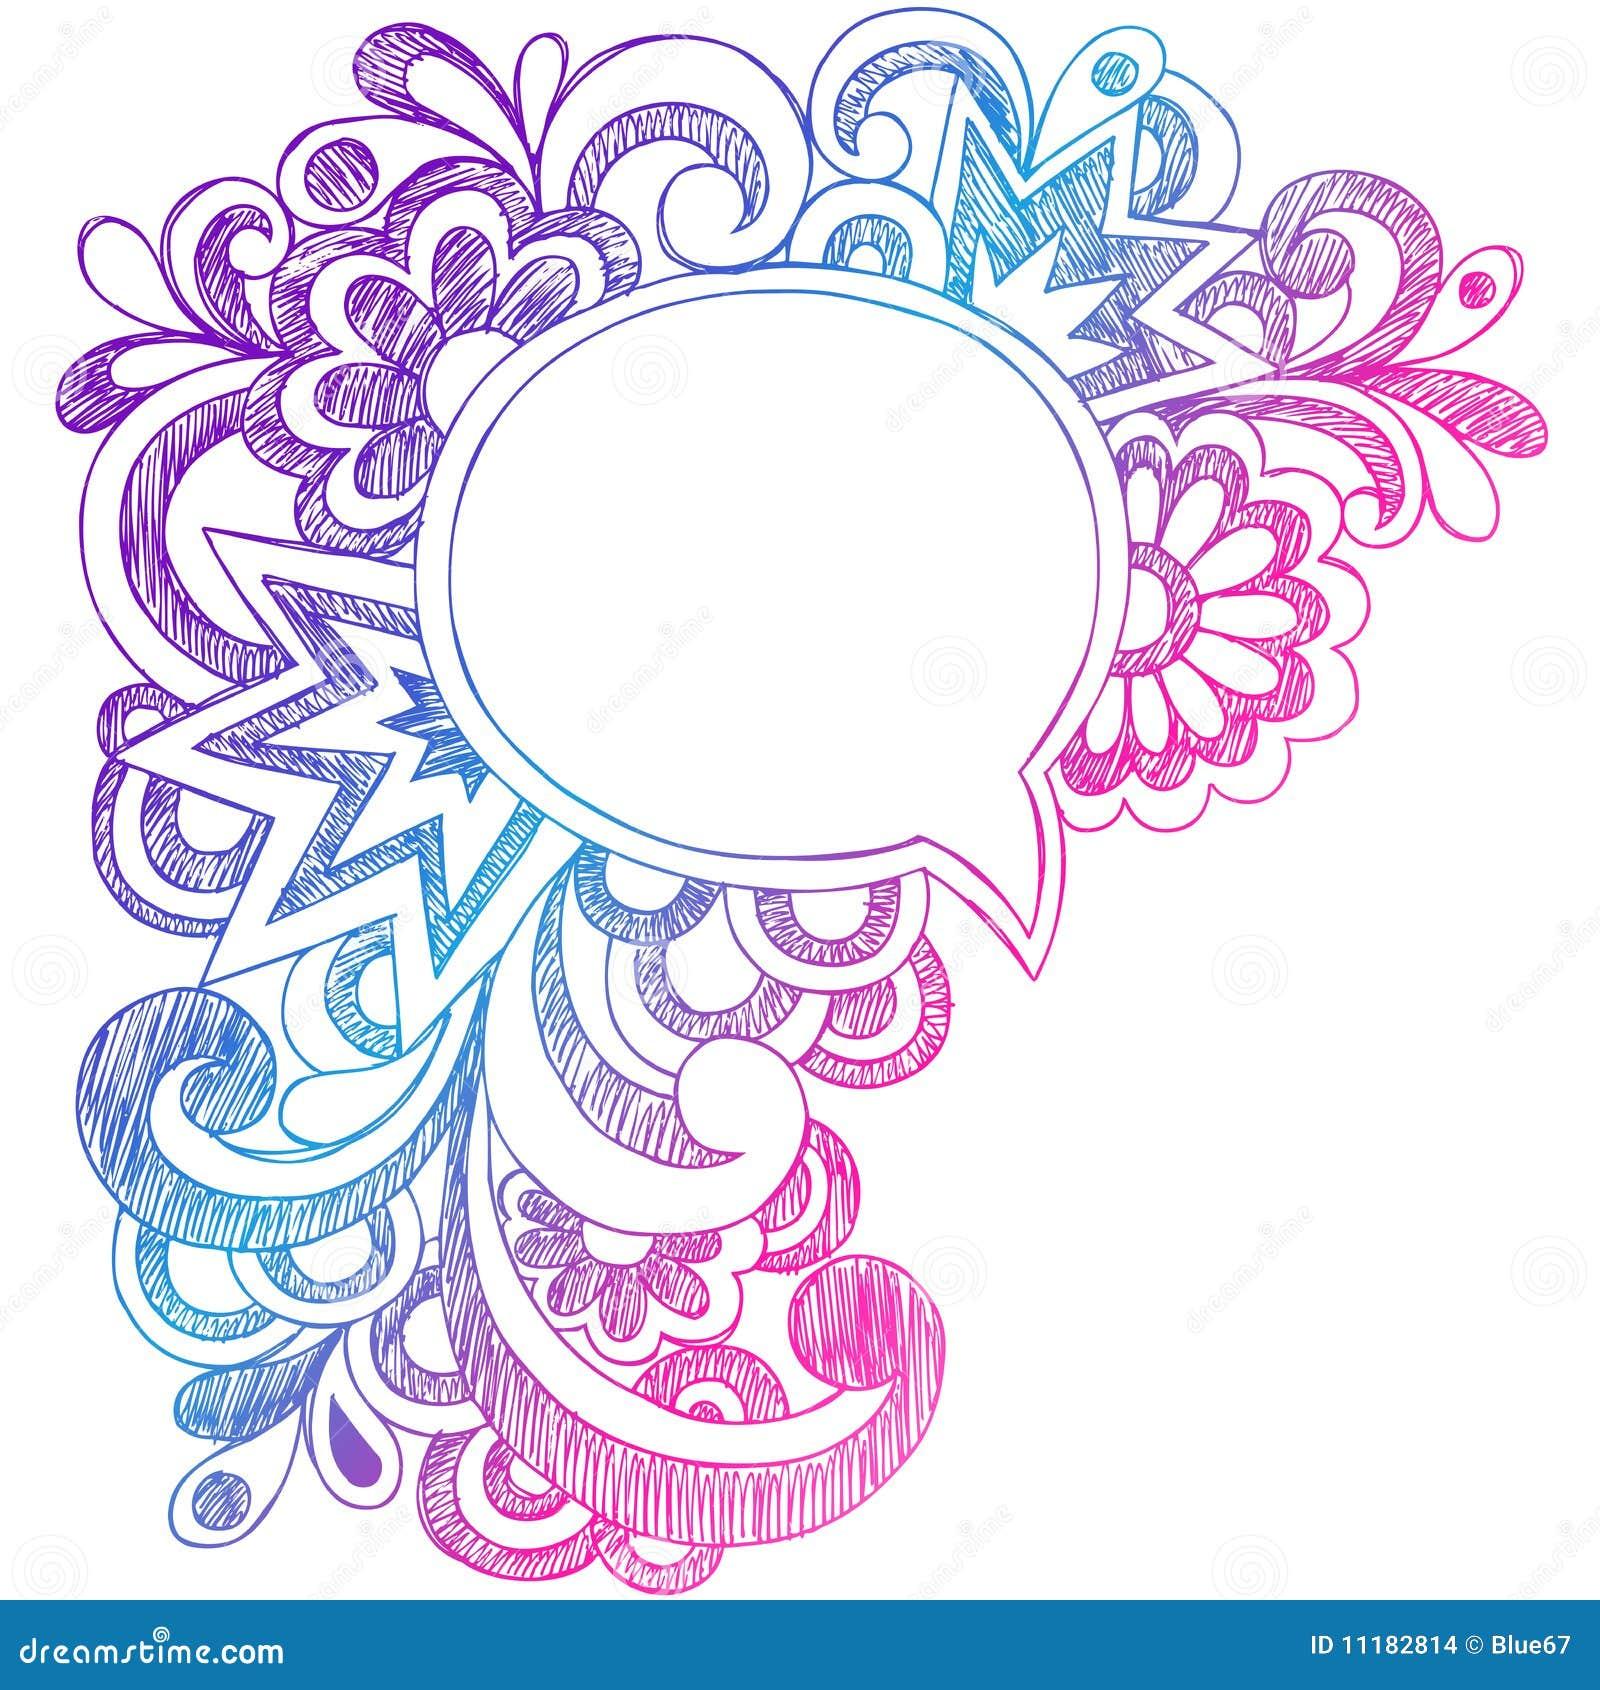 Speech Bubble Sketchy Notebook Doodles Frame Stock Vector - Image: 11182814